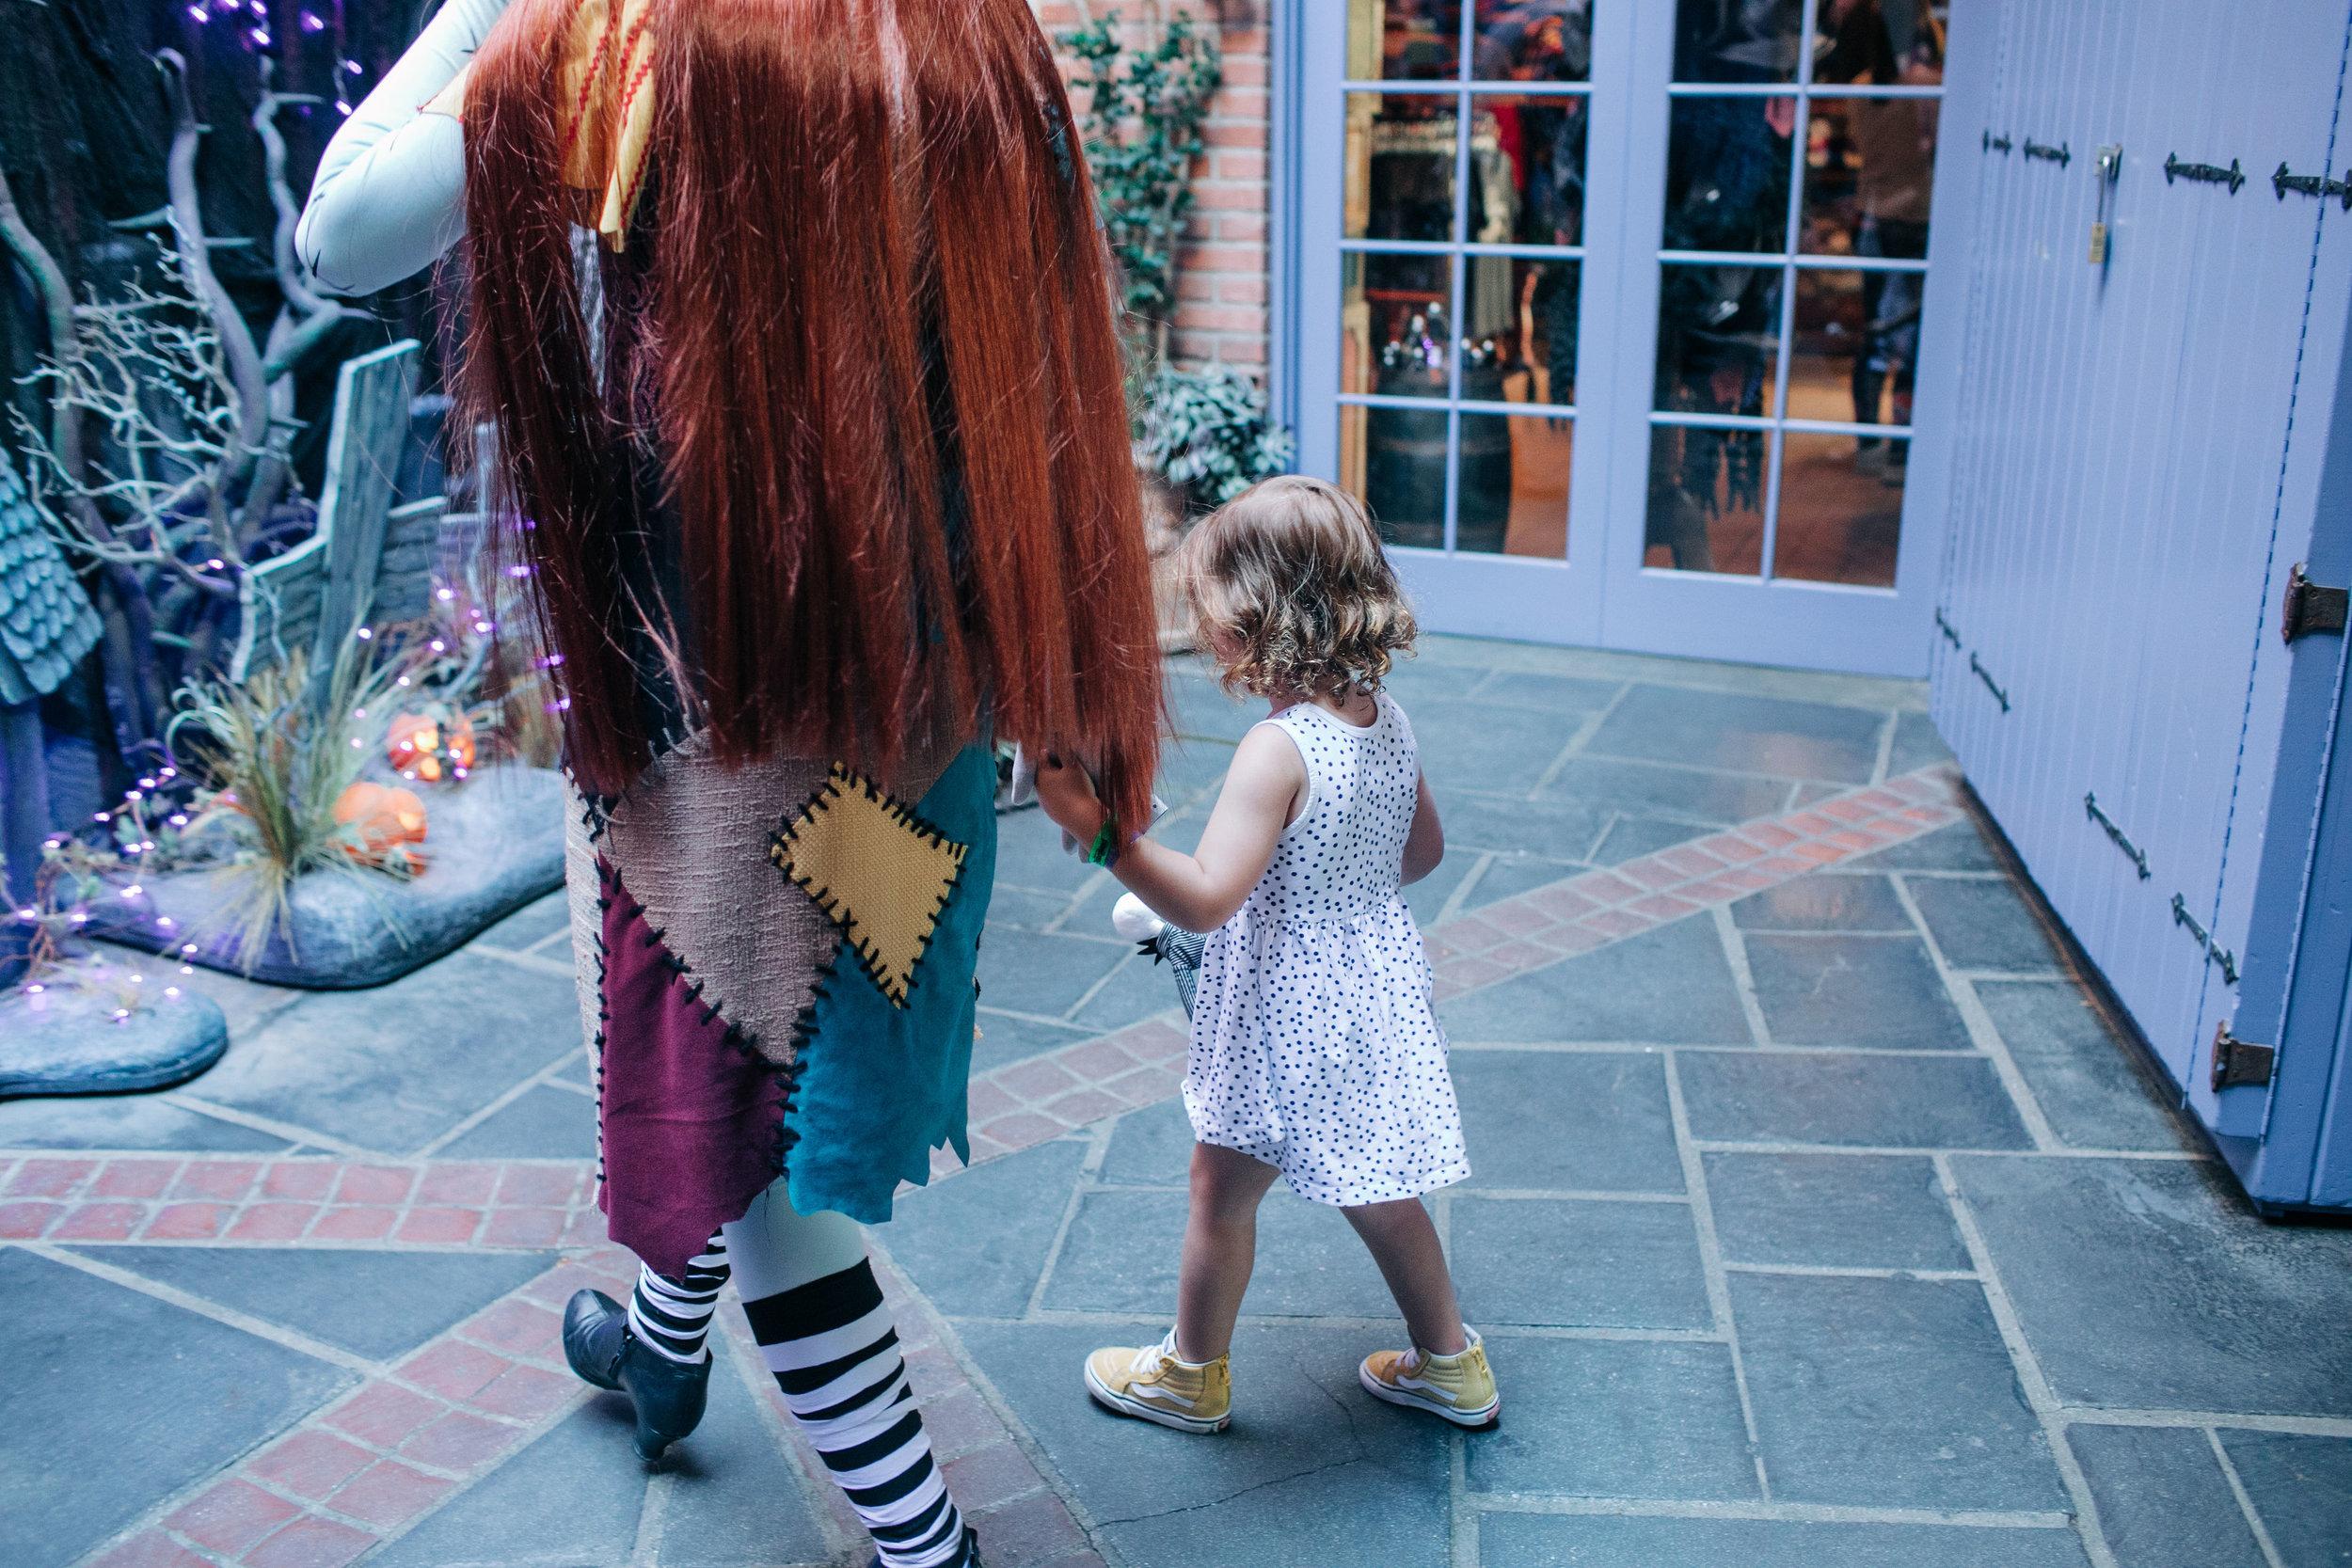 Disneyland_Halloween-LilyRoPhotography-99.jpg